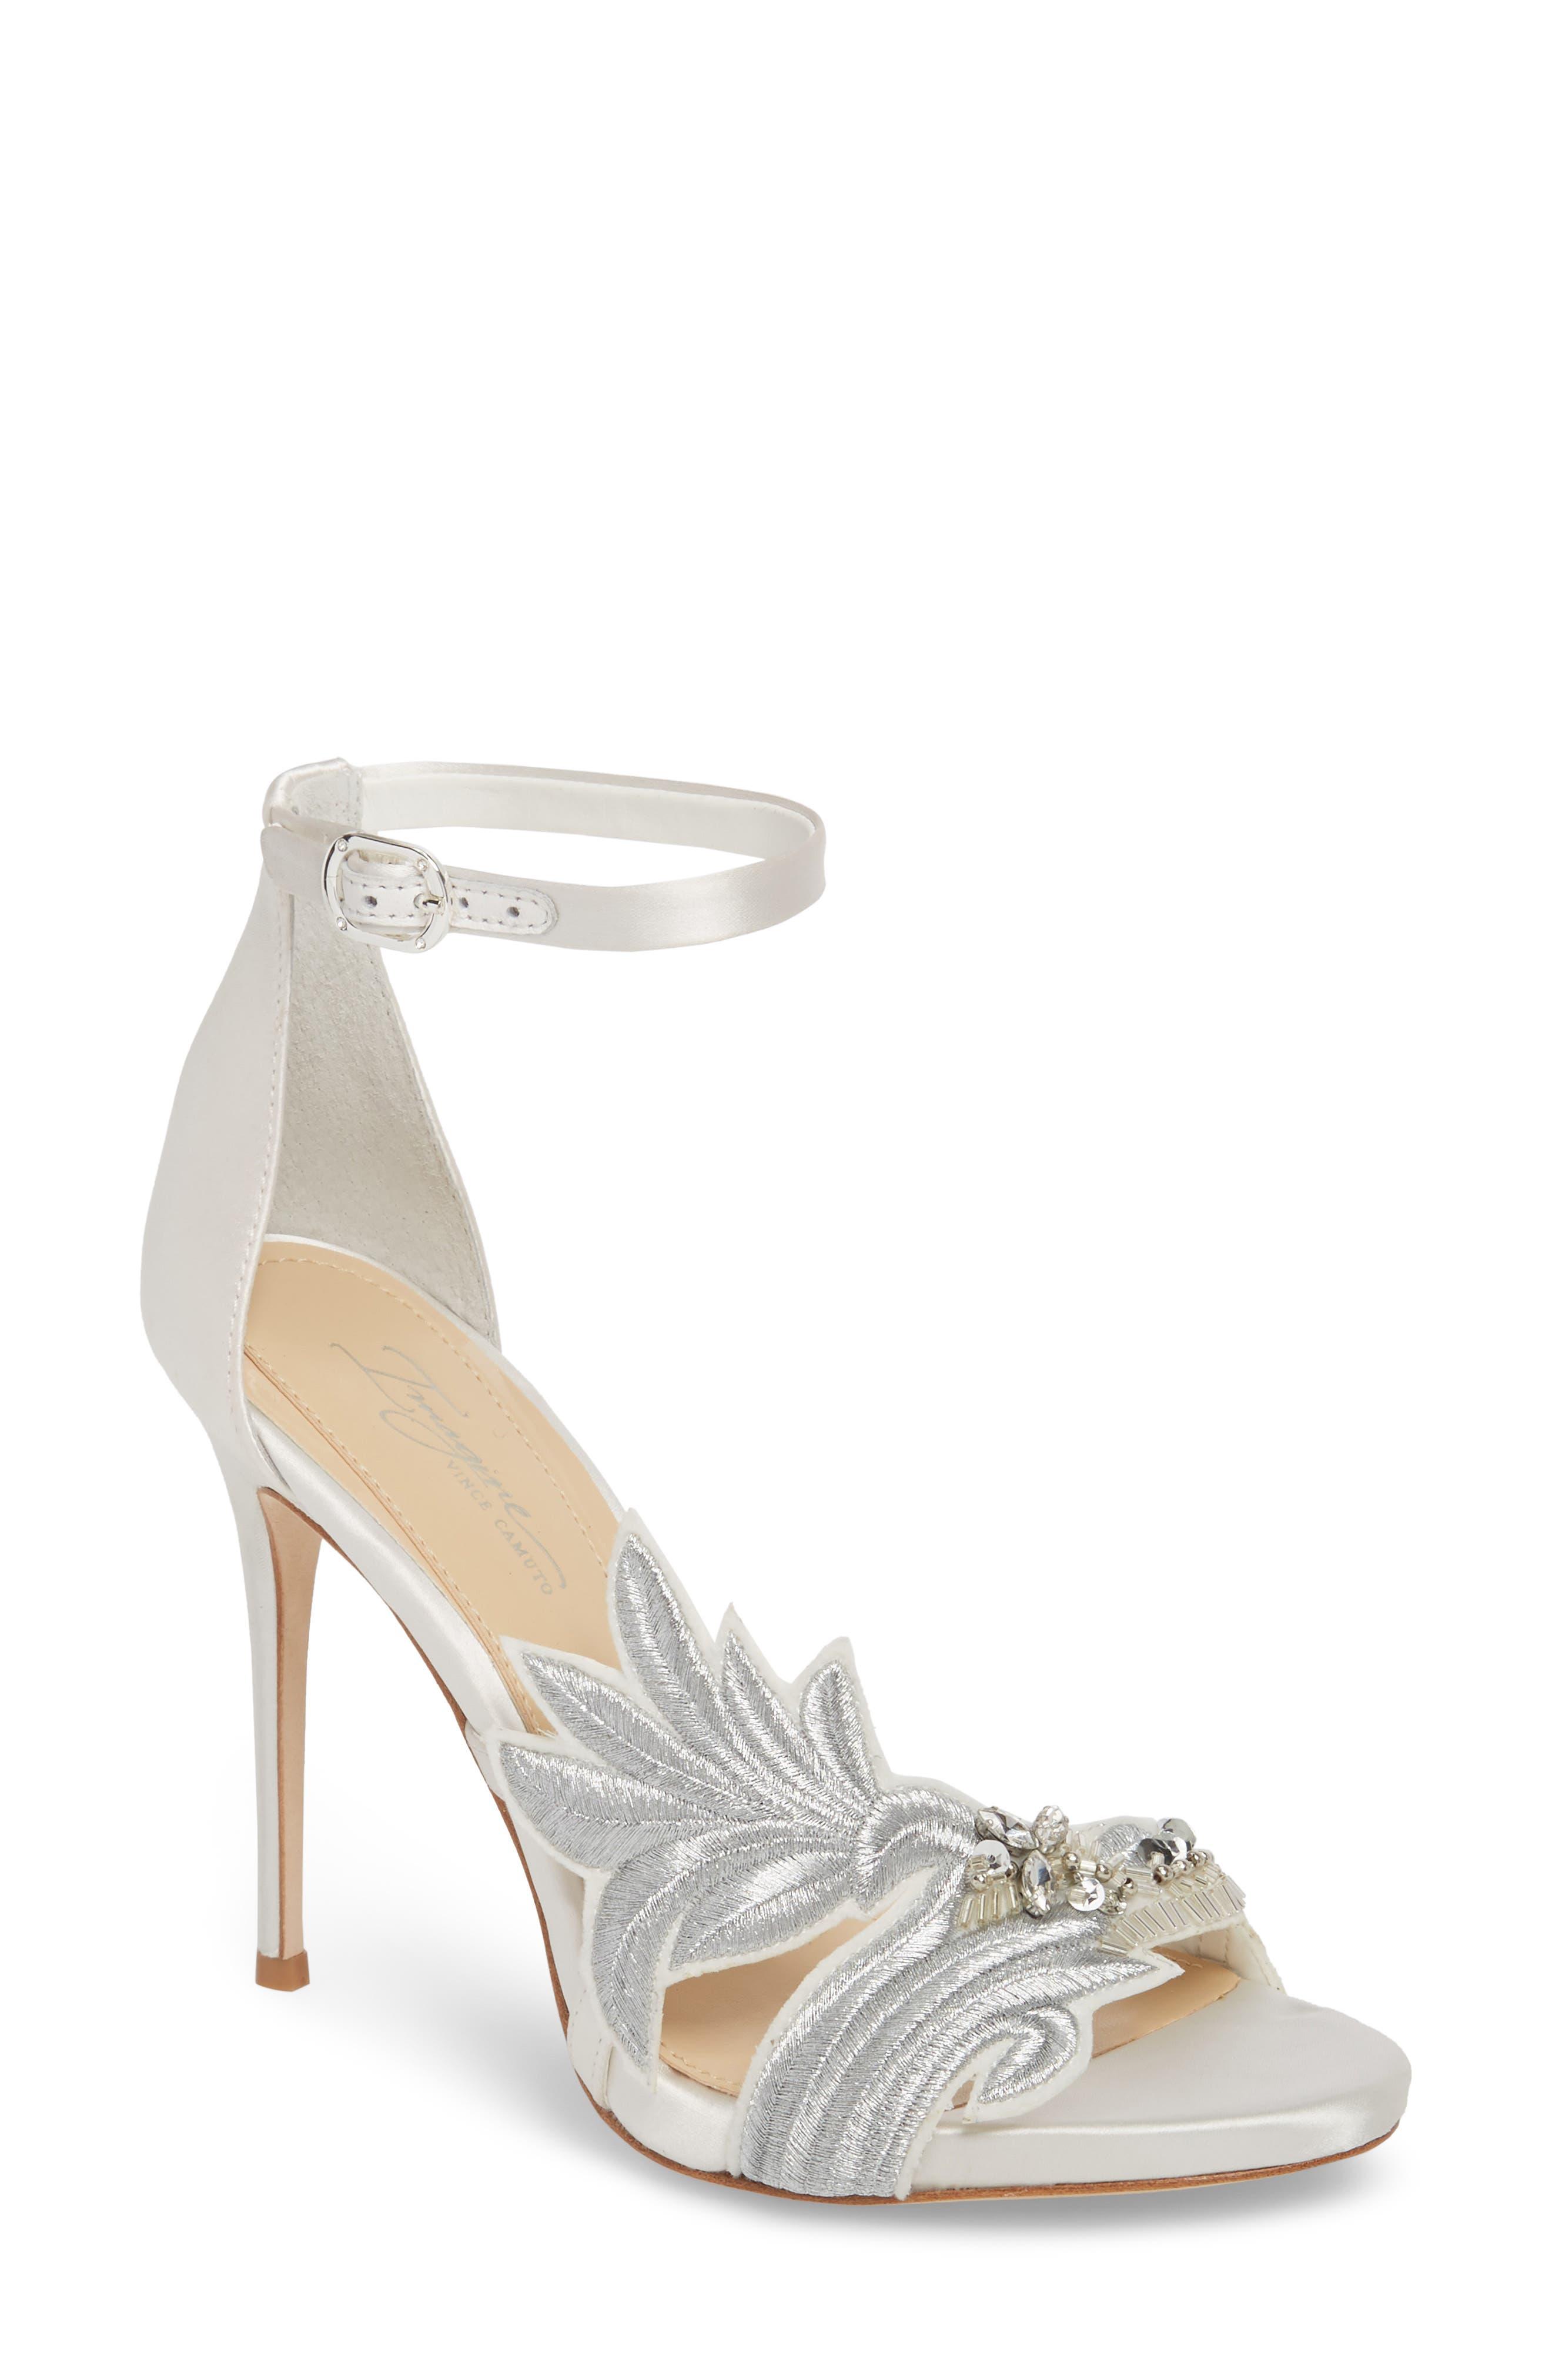 Imagine Vince Camuto Dayanara Embellished Sandal,                             Main thumbnail 1, color,                             PURE WHITE SATIN